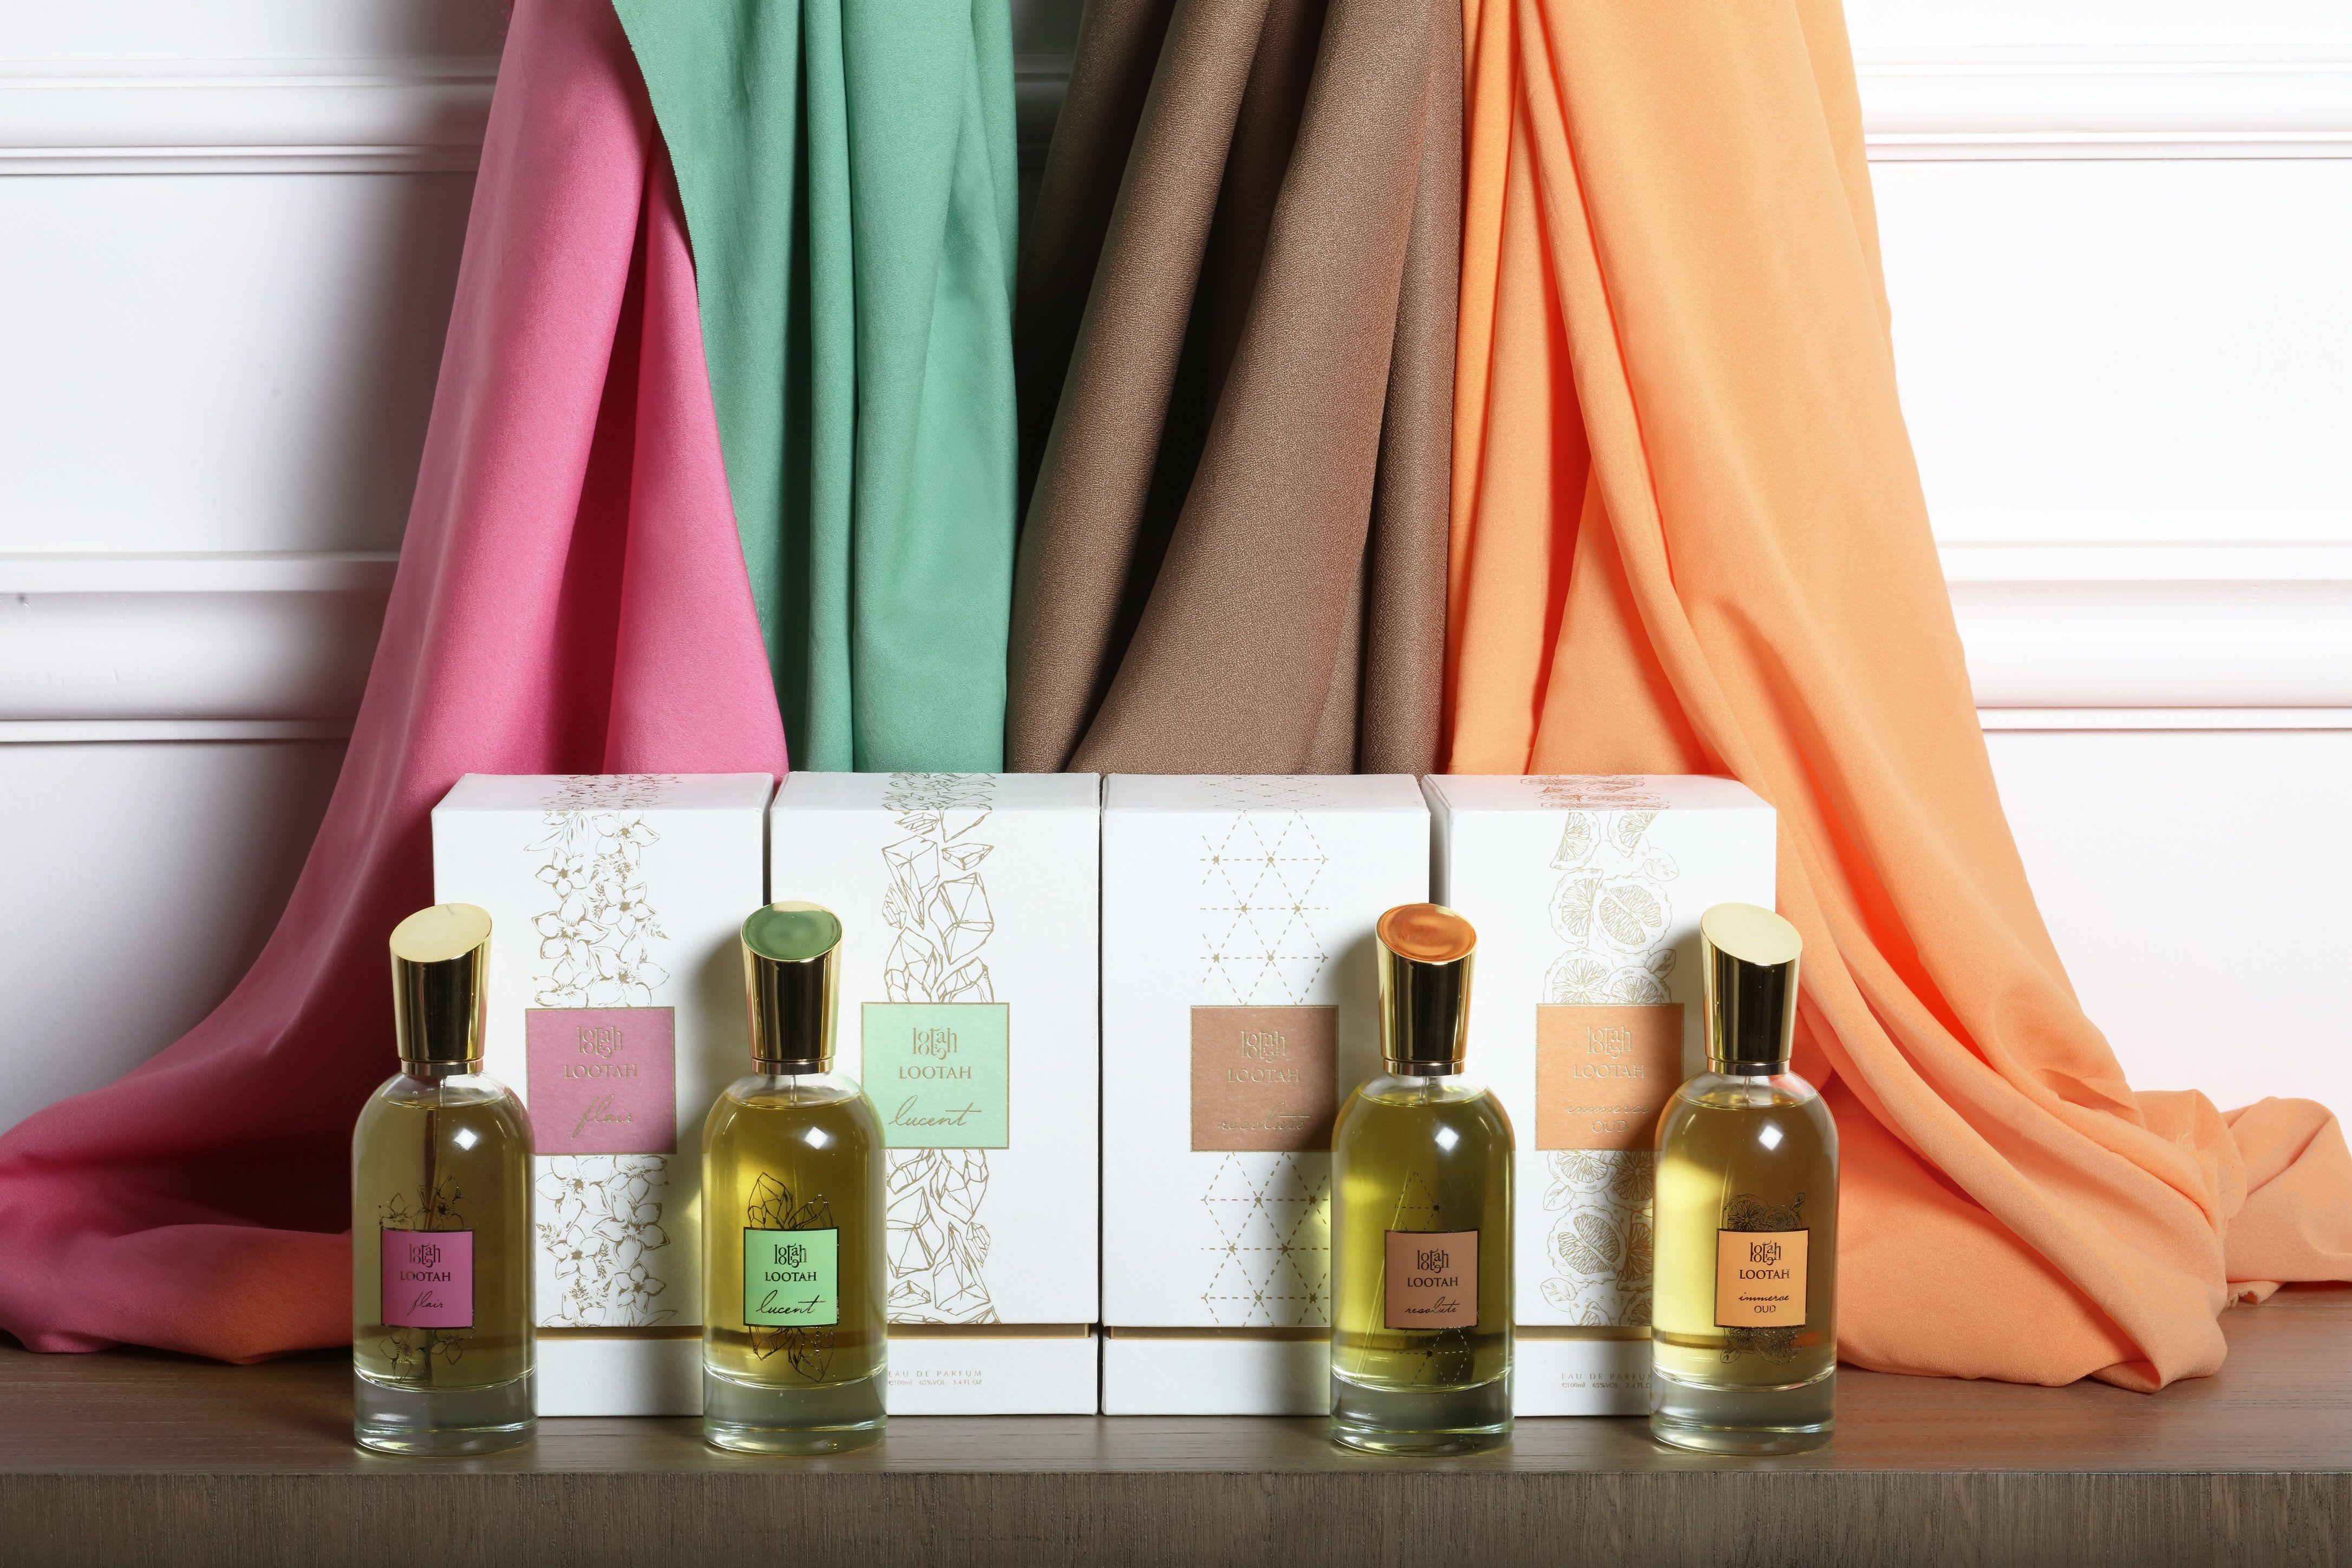 4 عطور جديدة إنضمت إلى عائلة لوتاه اليوم! . هل أنتم مستعدون للتعطر بجديدنا؟ . . 4 new perfumes have joined our family today! . Are you ready to try our new scents? . #lootahperfumes #newscents #newperfumes #perfume #Incense #fragrantoil #incense #scent #abudhabi #luxury #fragrance #elegance #classic #fragrantica #oriental #perfumes #mydubai #mydxb #mydubailifestyle #mydxblifestyle #forher #forhim